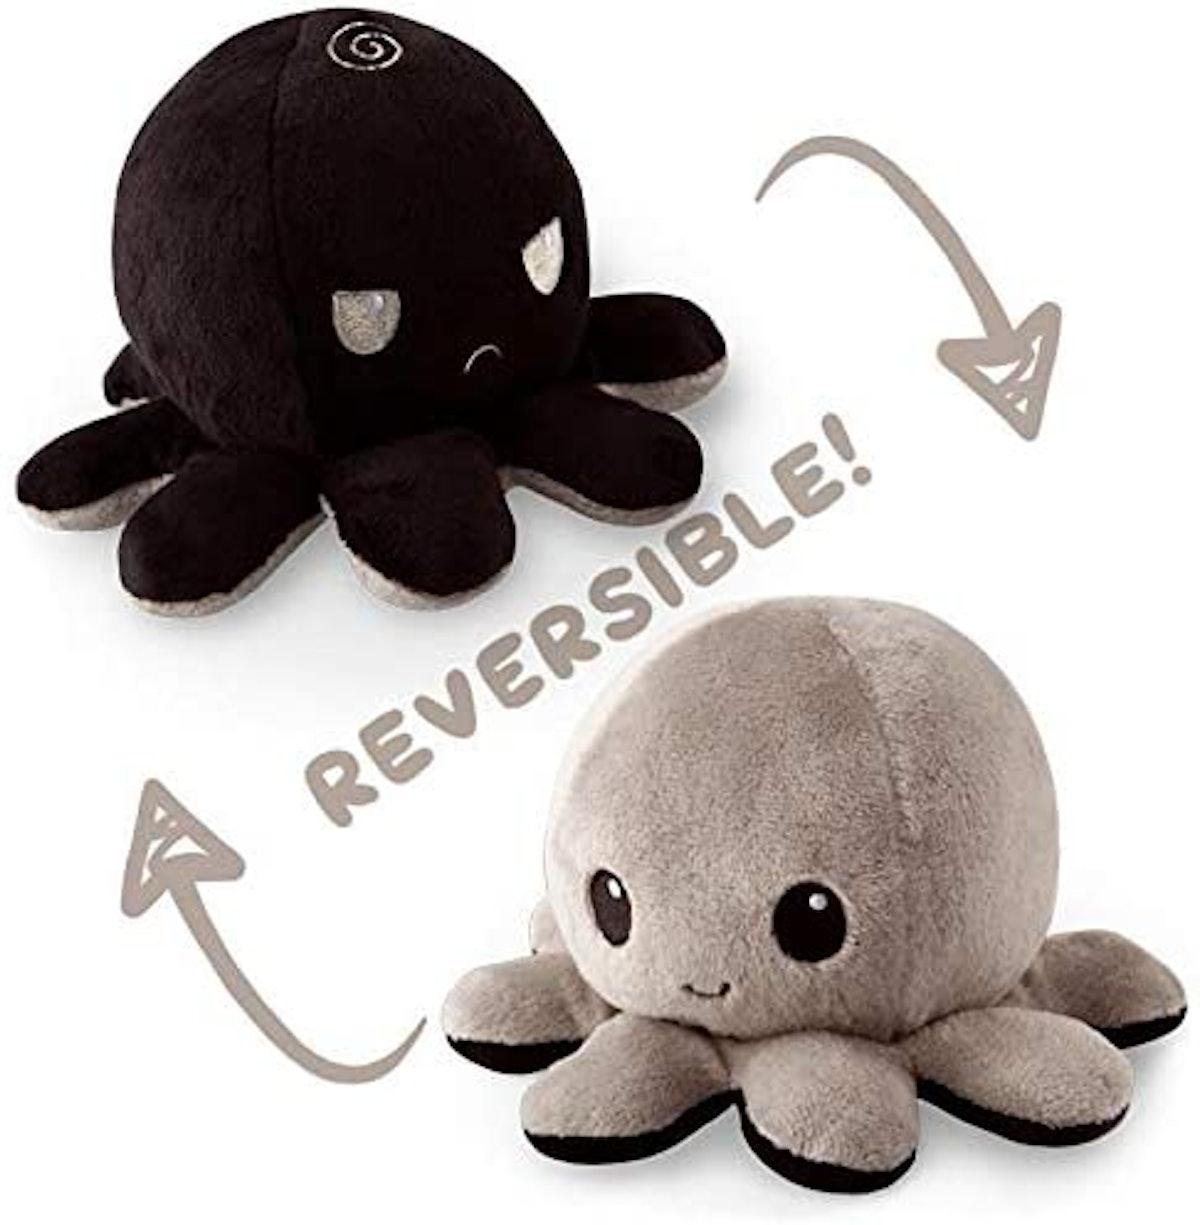 Teeturtle Reversible Octopus Plushie